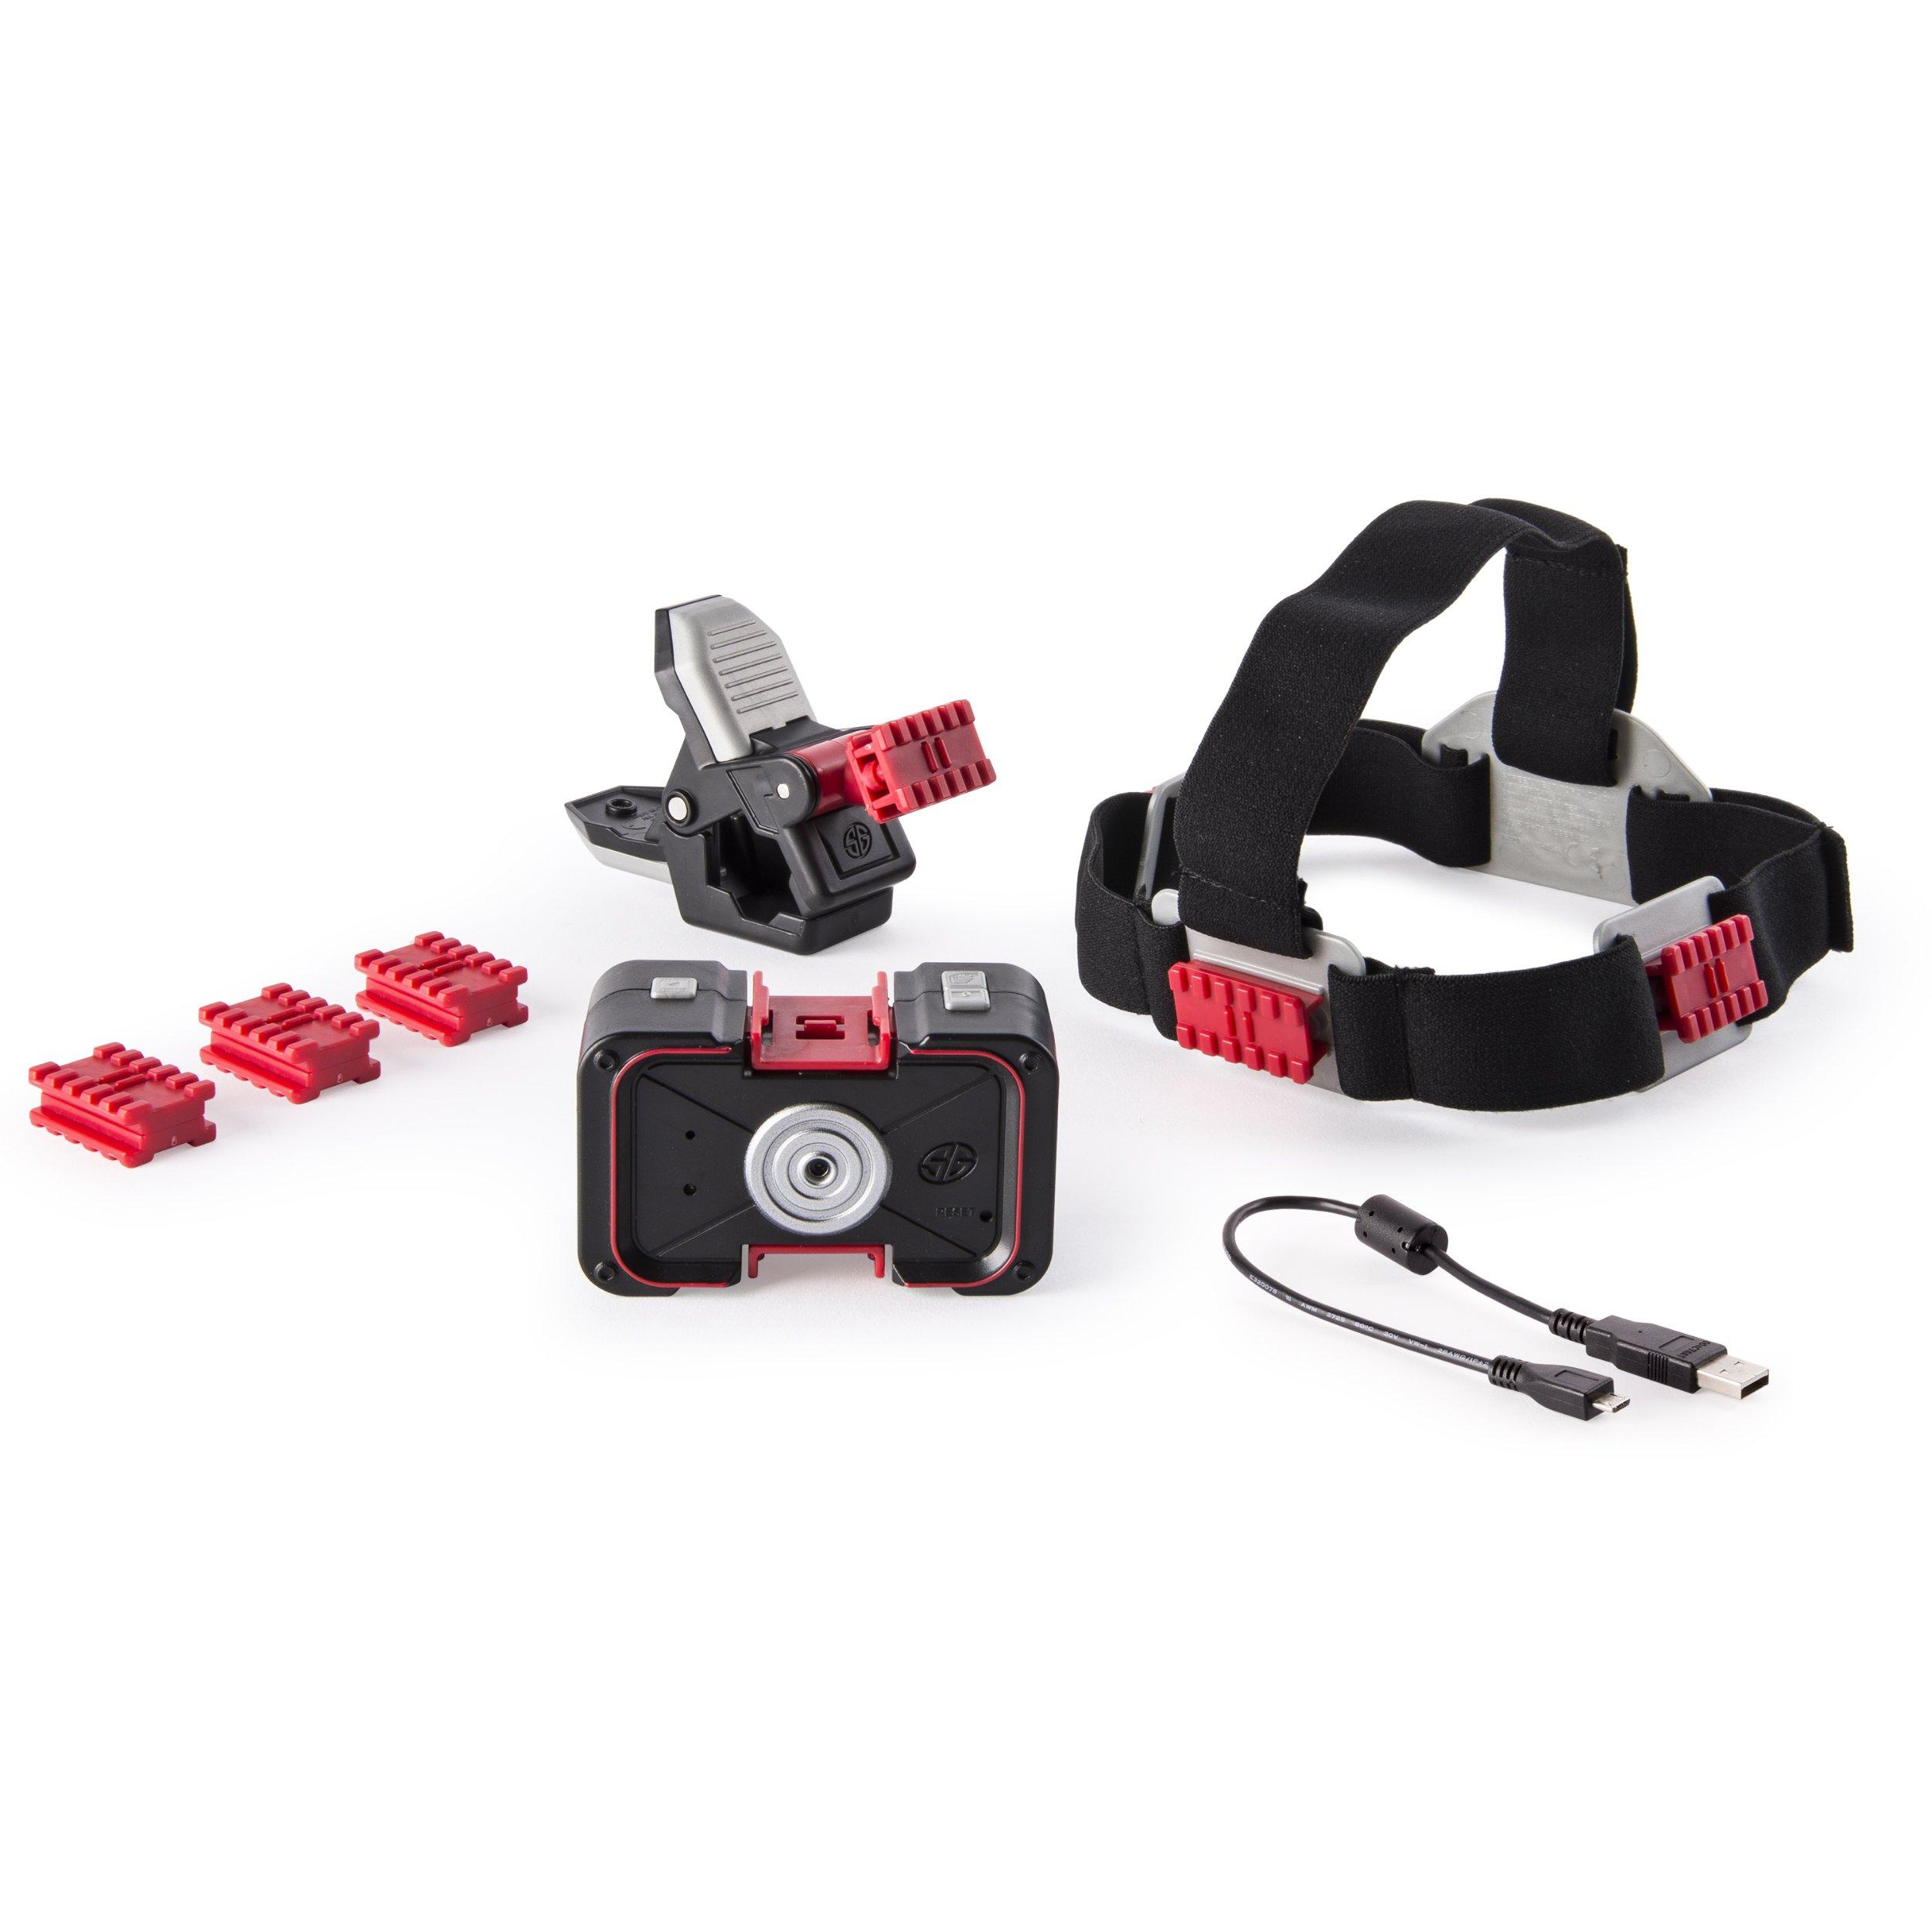 Spy Gear - Spy Go Action Camera by Spy Gear